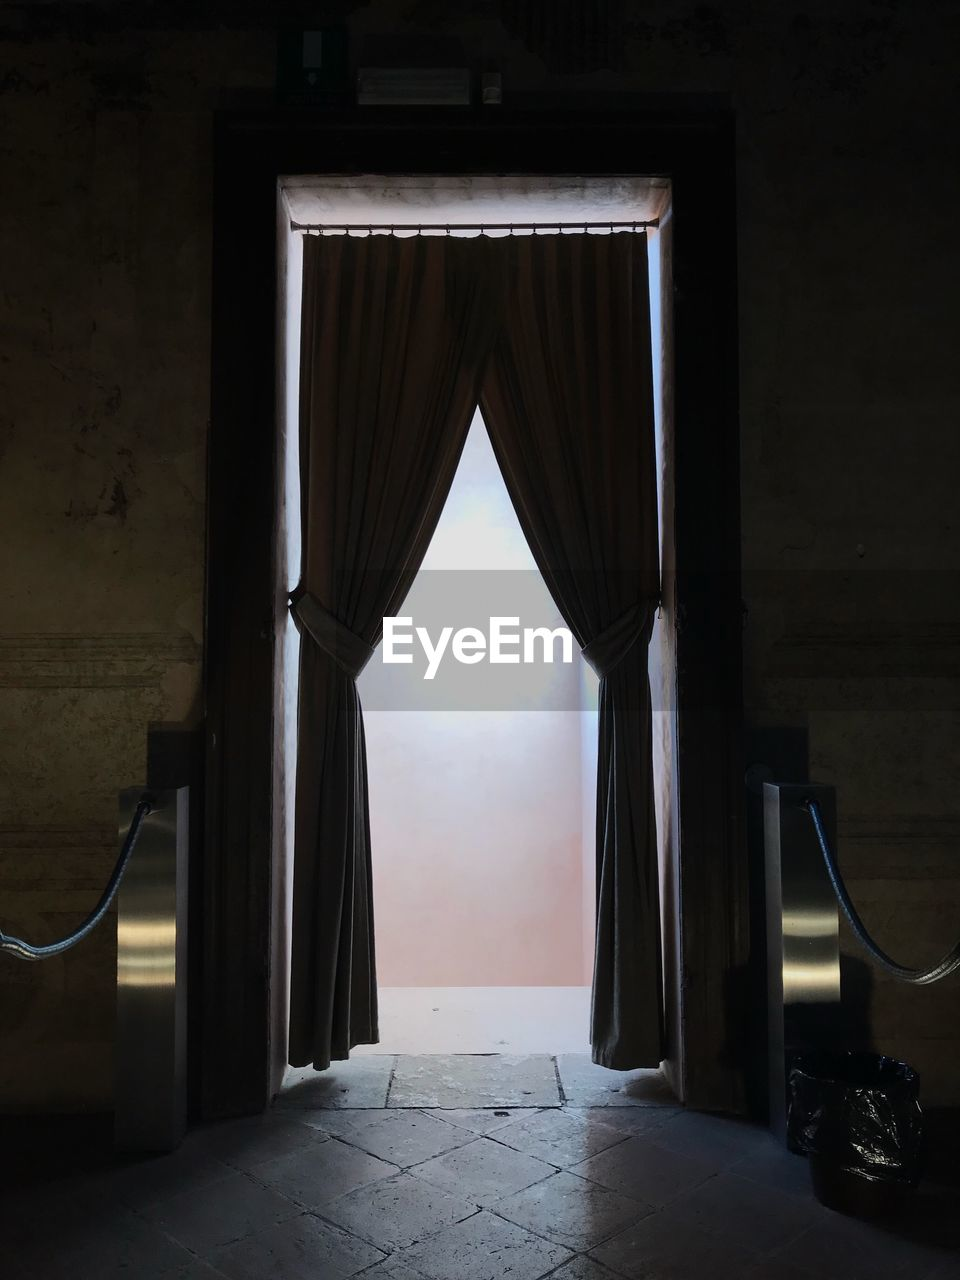 Empty entrance into corridor of building with curtain